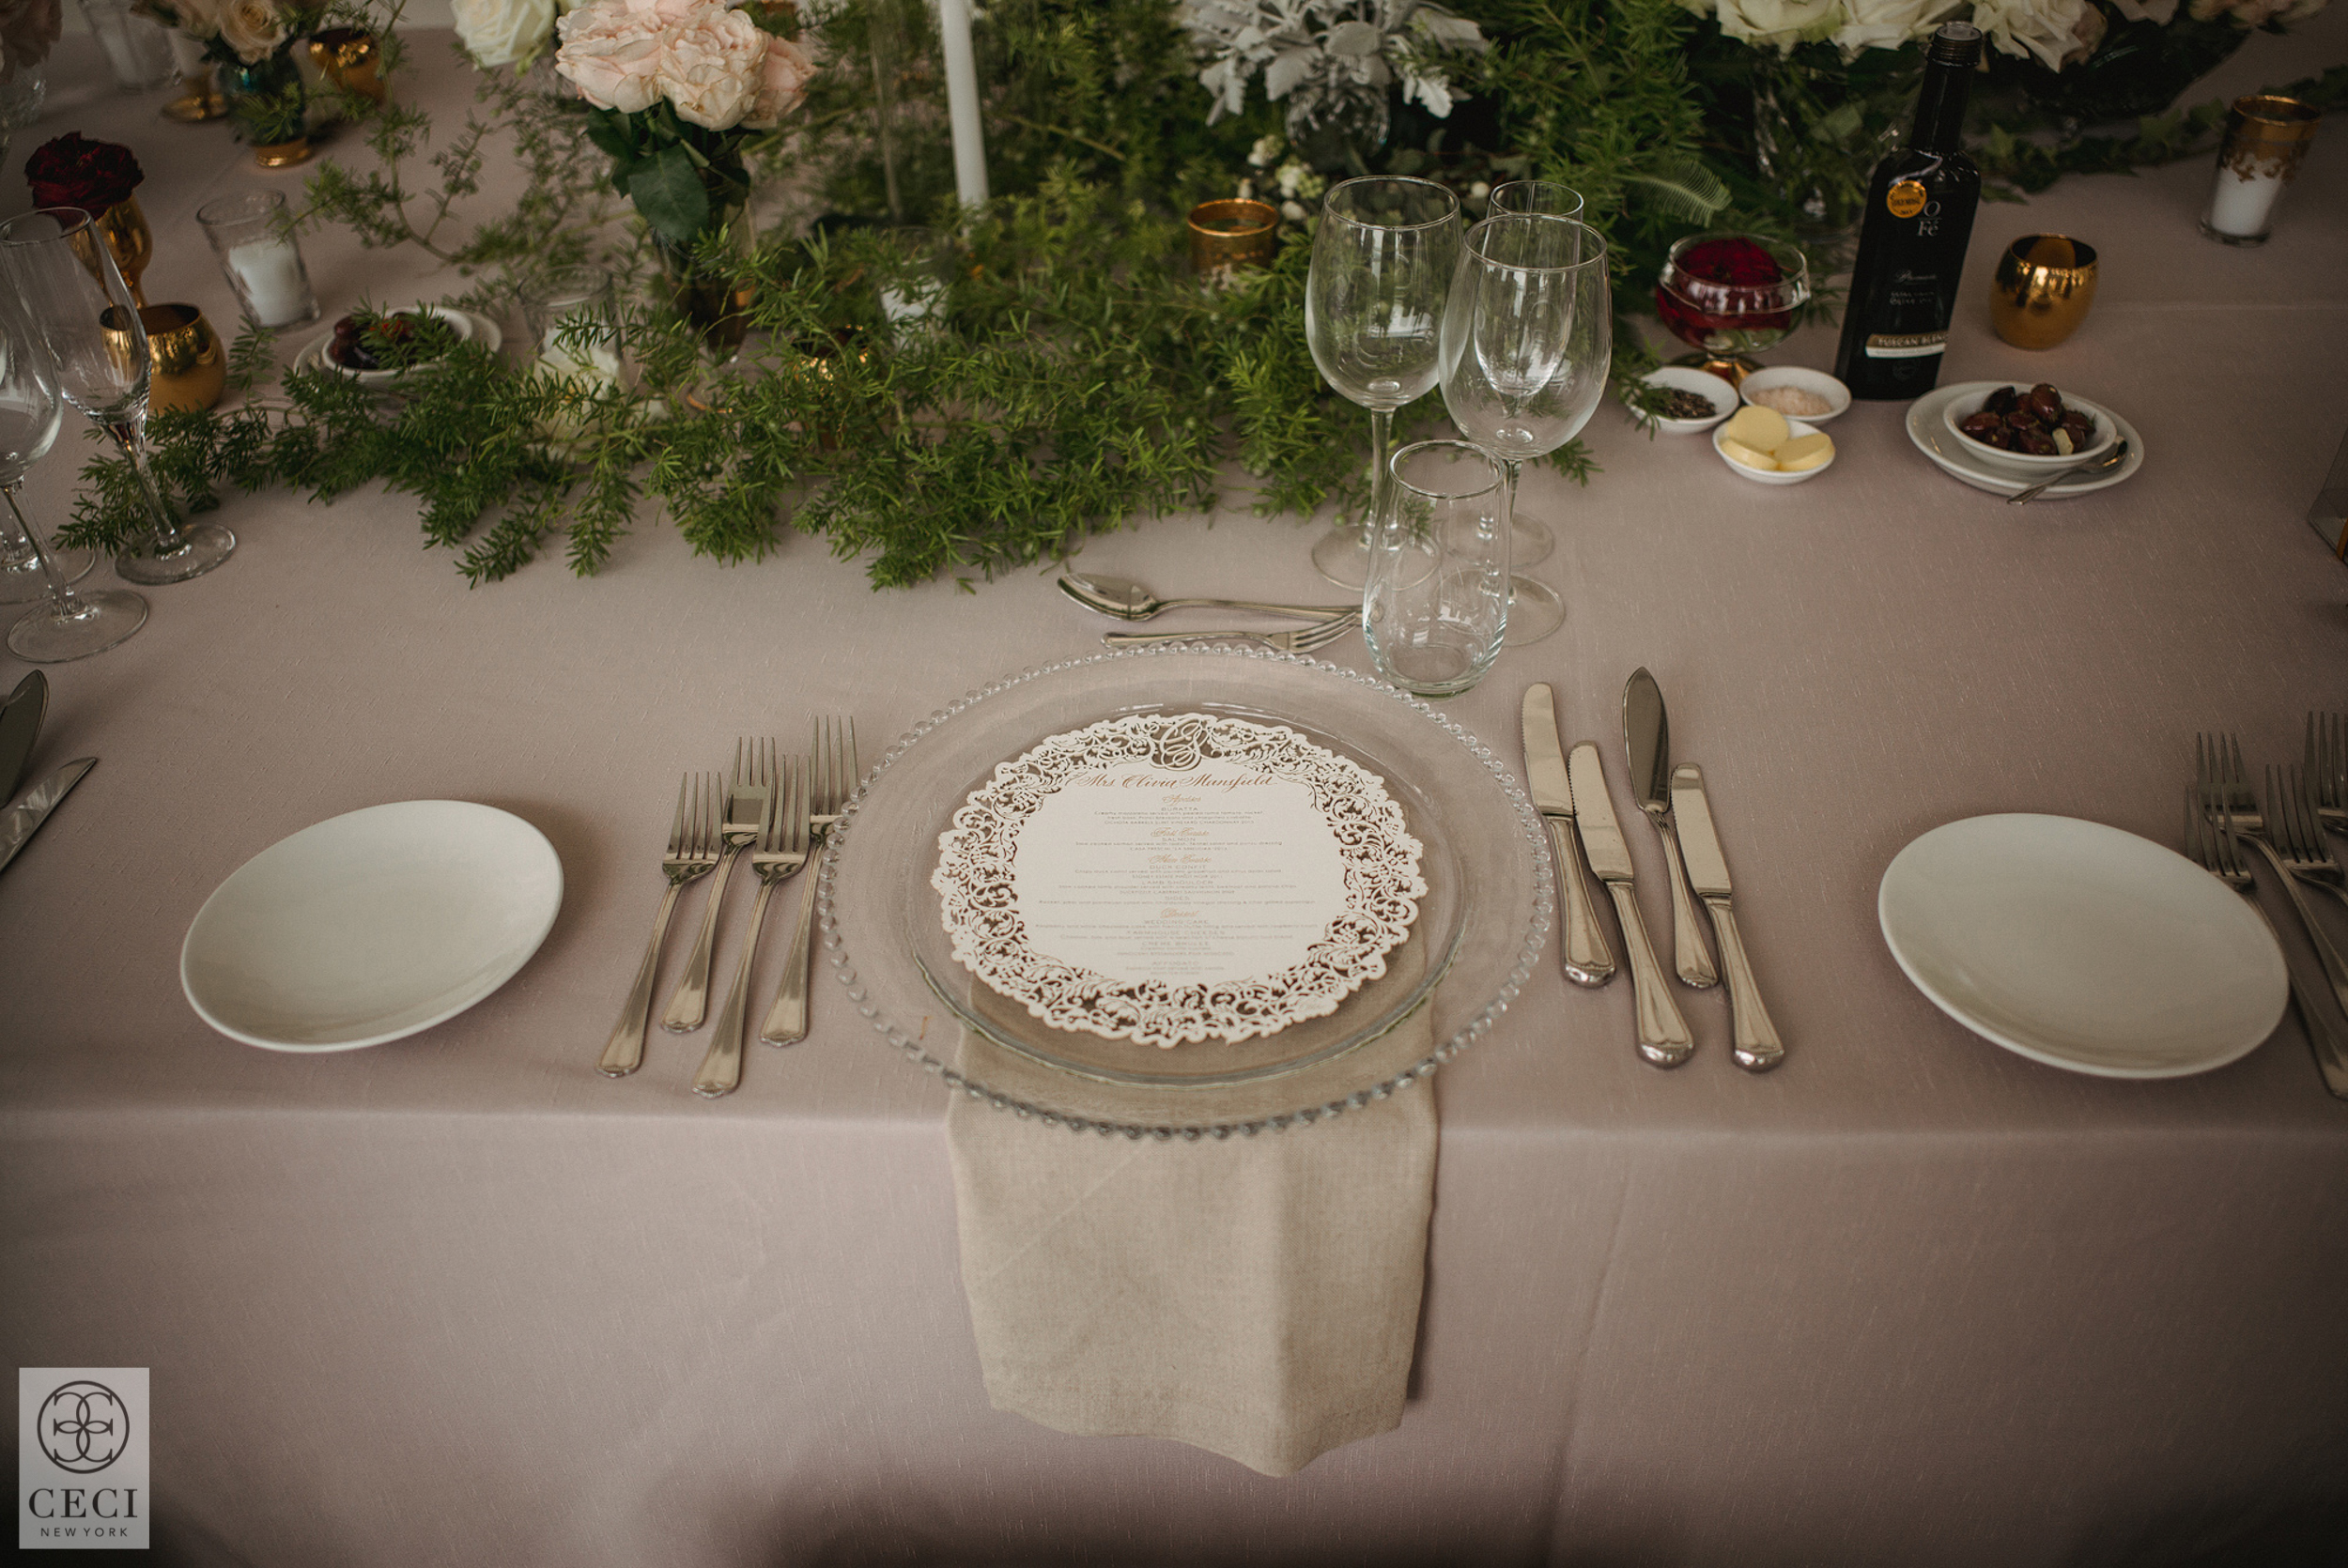 Ceci_New_York_Custom_Luxury_Wedding_BeautyShot_LaserCut_Stationery_Personalized_Couture_Foil_Stamping_Perth_Destination_Australia_Chic_-14.jpg